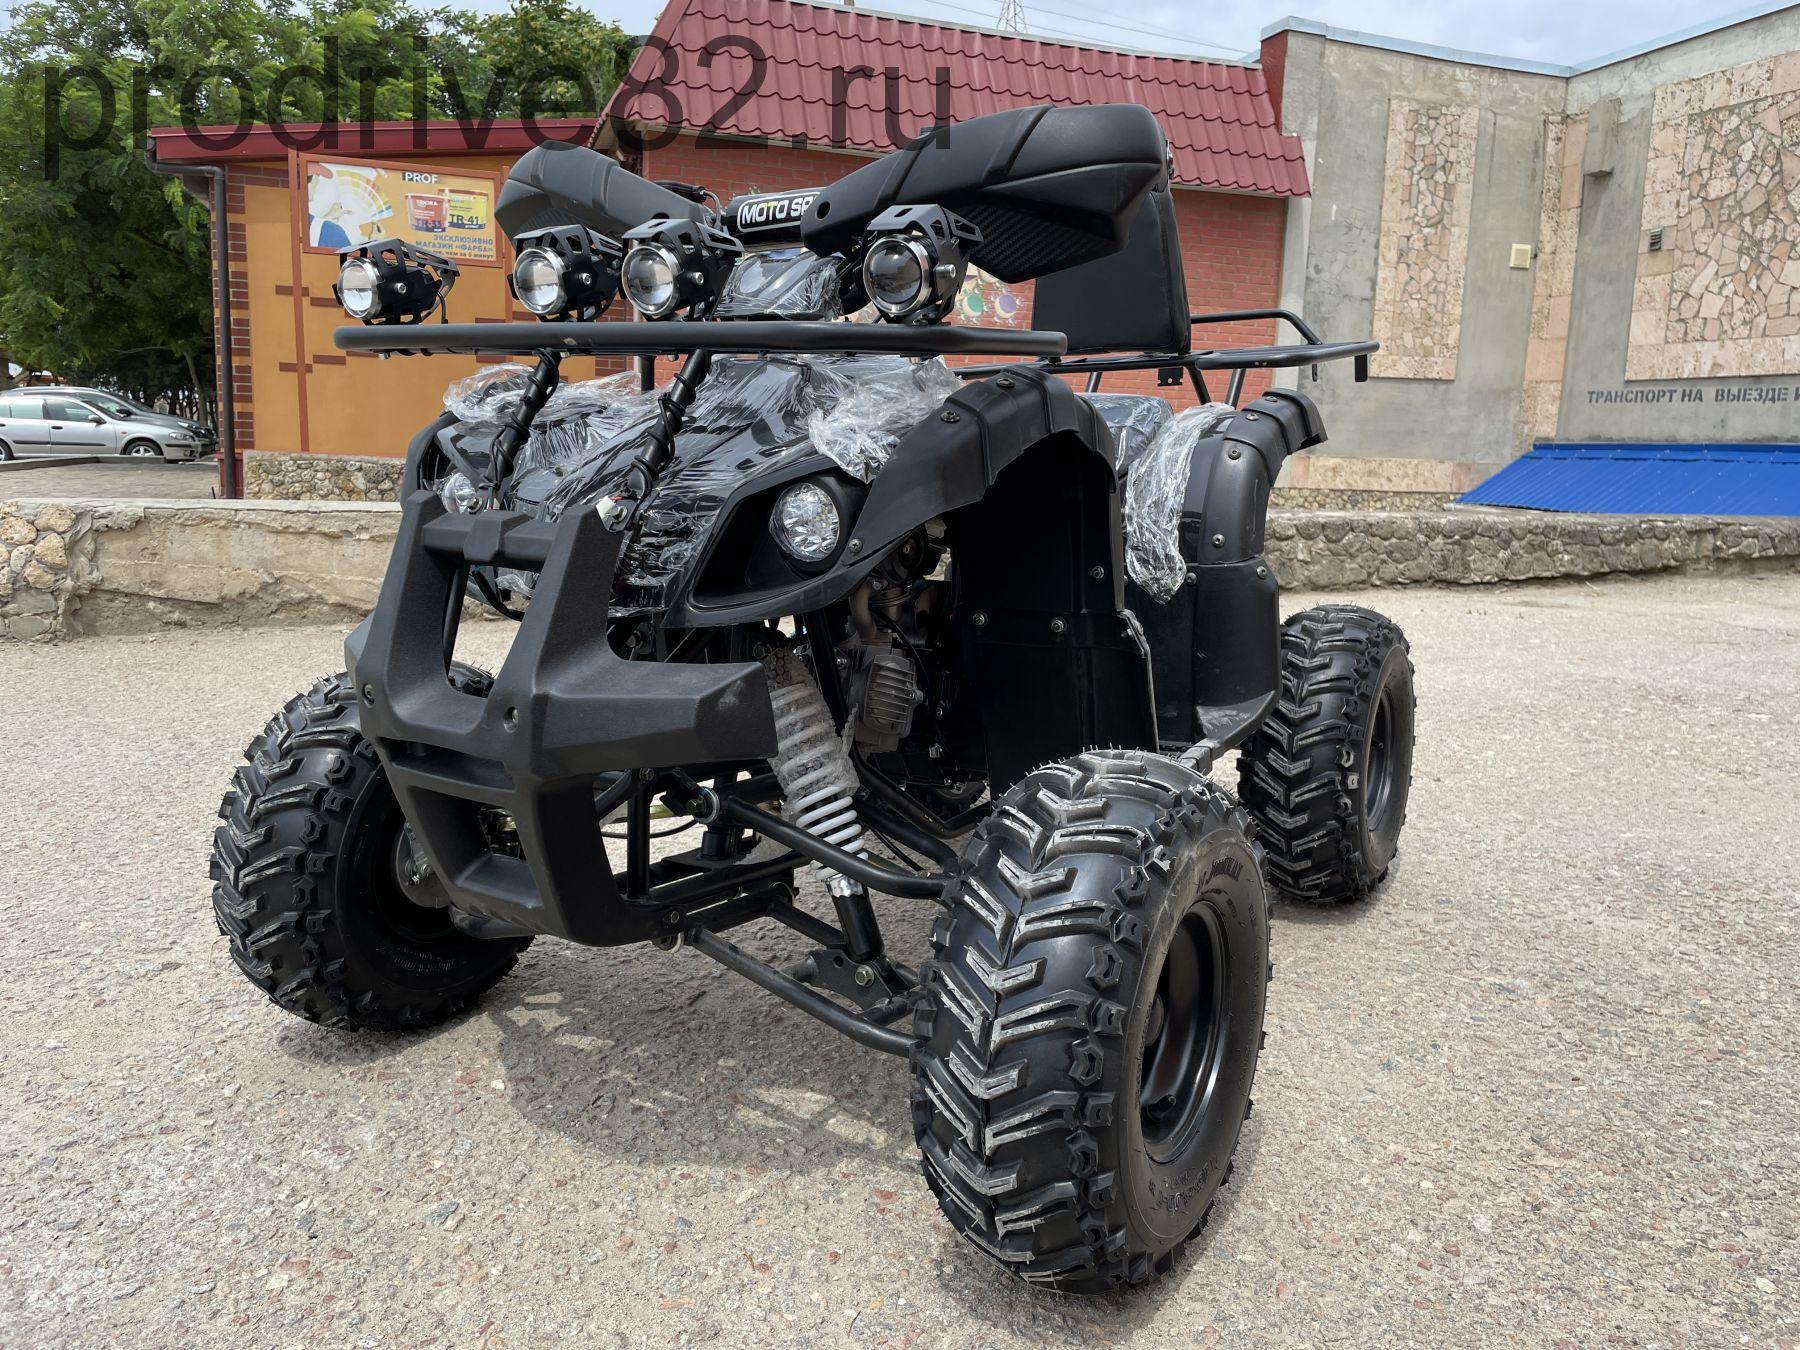 Grizzly 125 cc Квадроцикл бензиновый